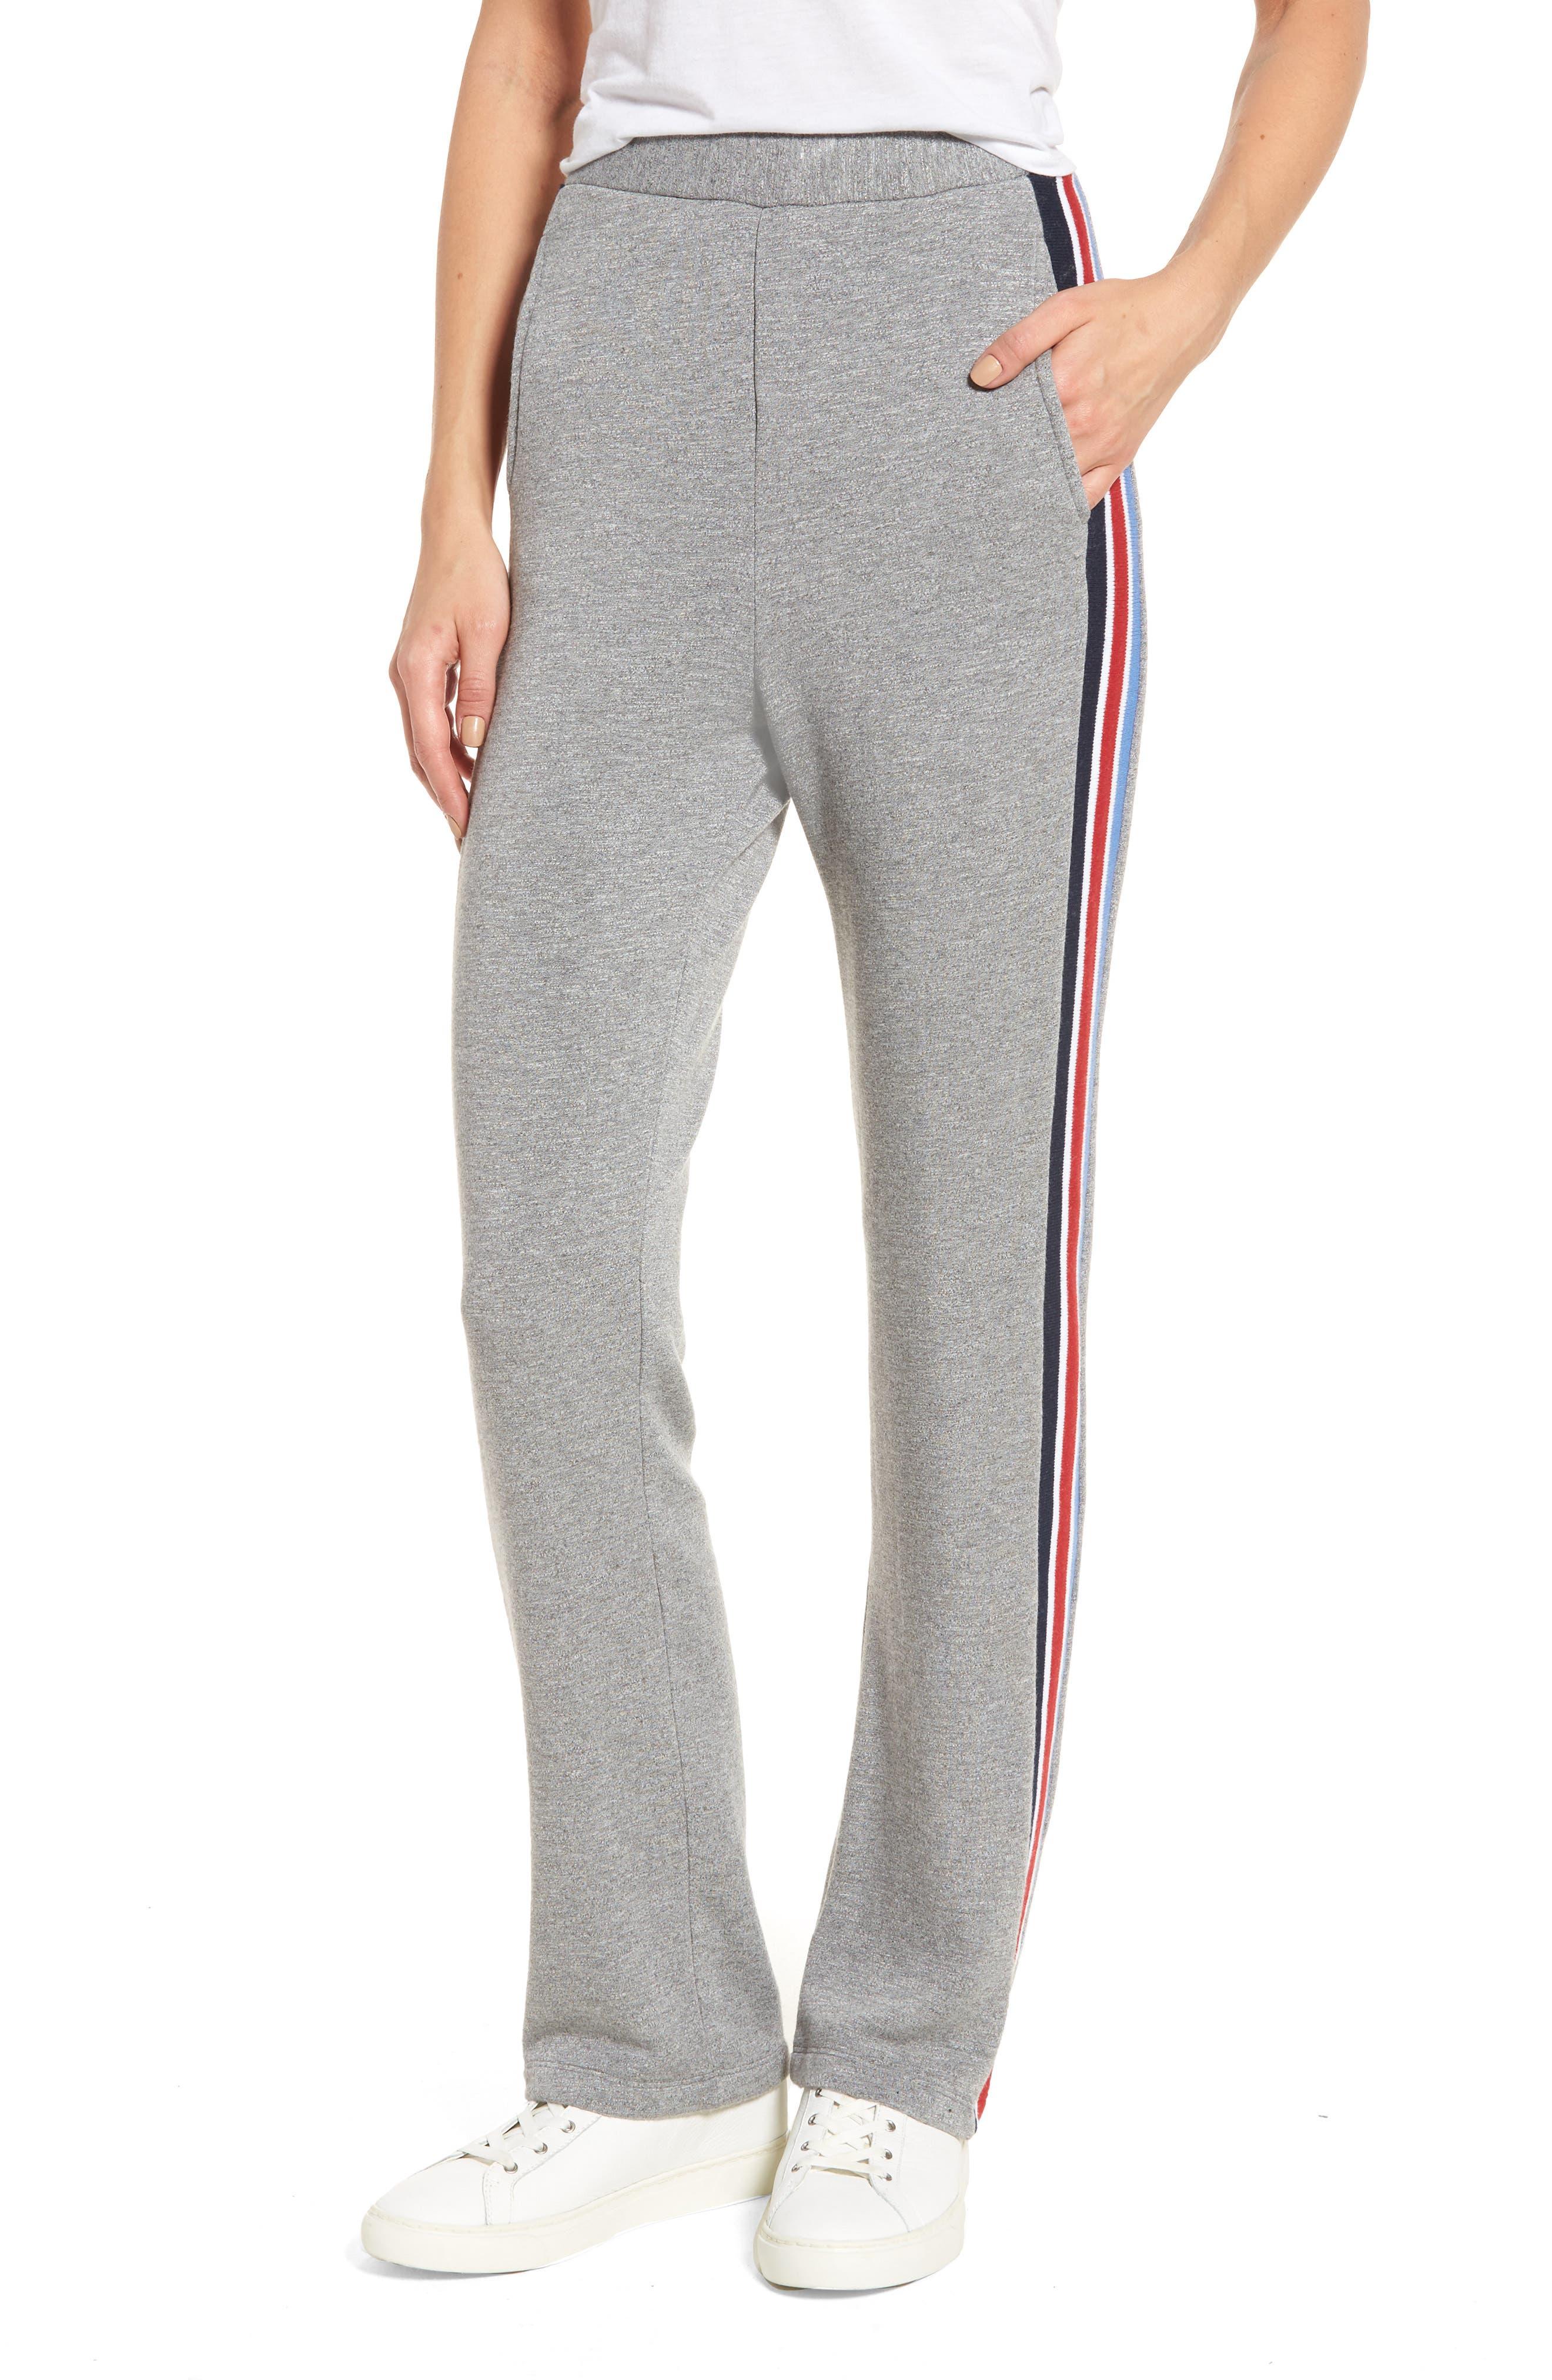 Alternate Image 1 Selected - Stateside Fleece Sweatpants